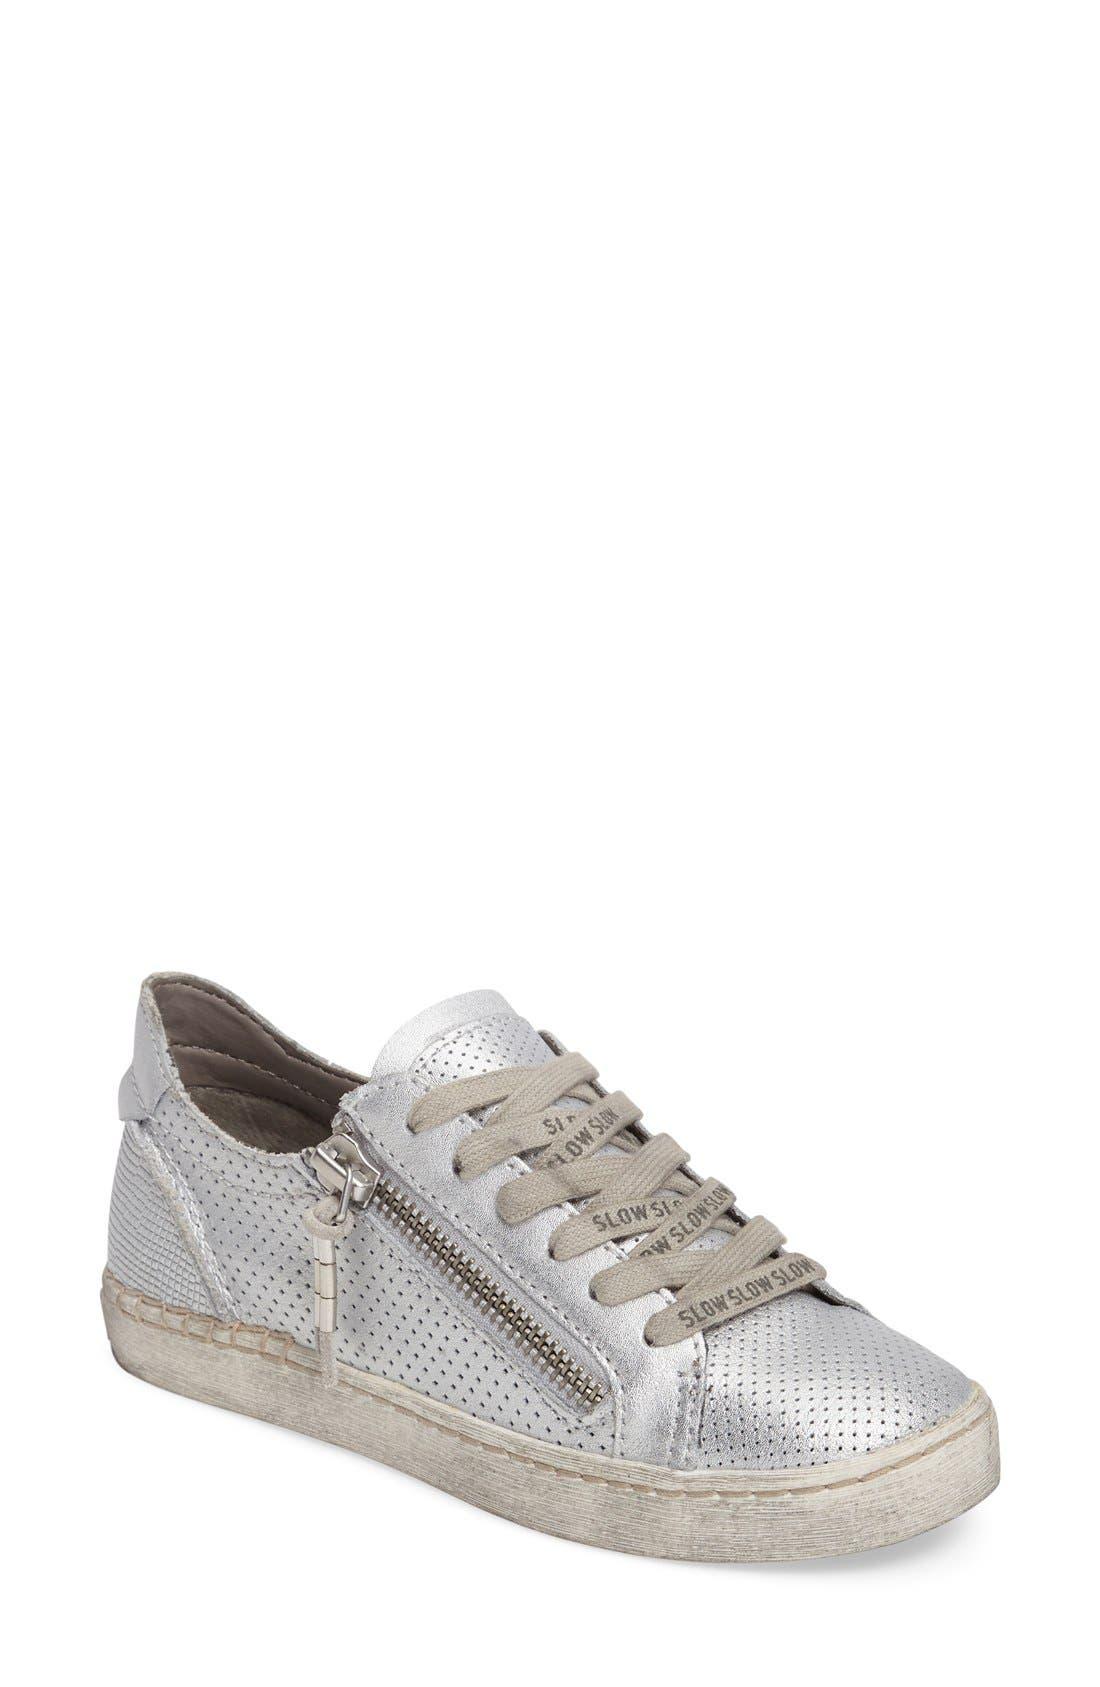 Alternate Image 1 Selected - Dolce Vita Zombie Sneaker (Women)